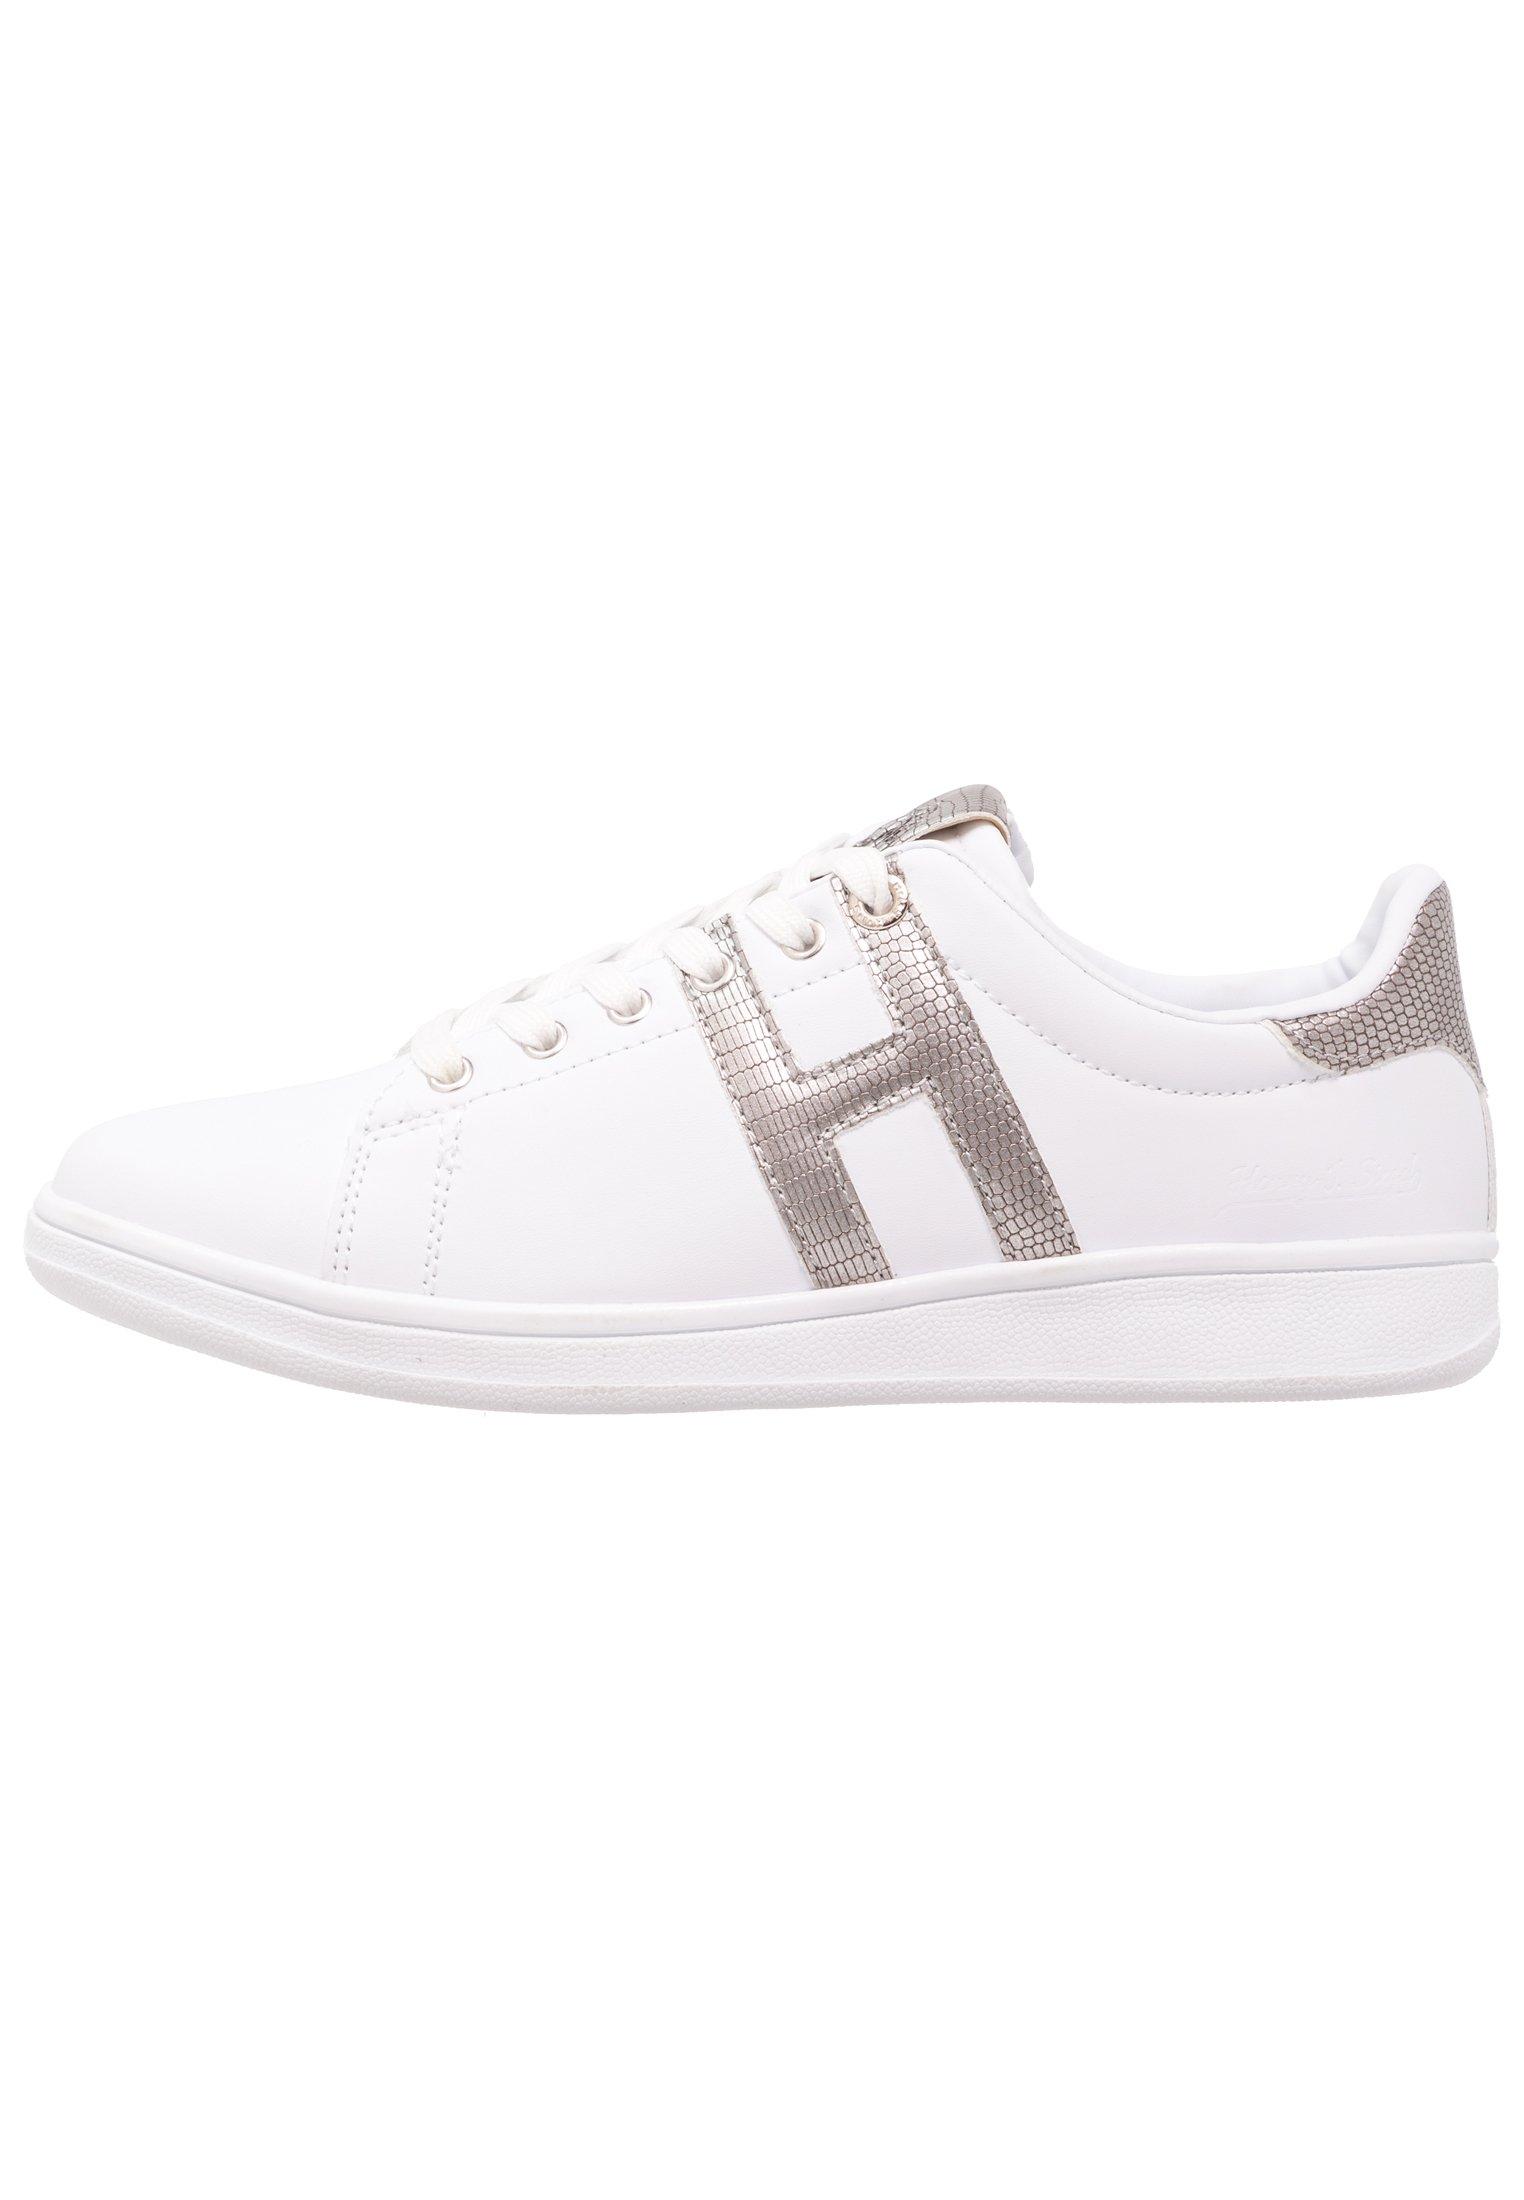 H.i.s Joggesko - White/silver